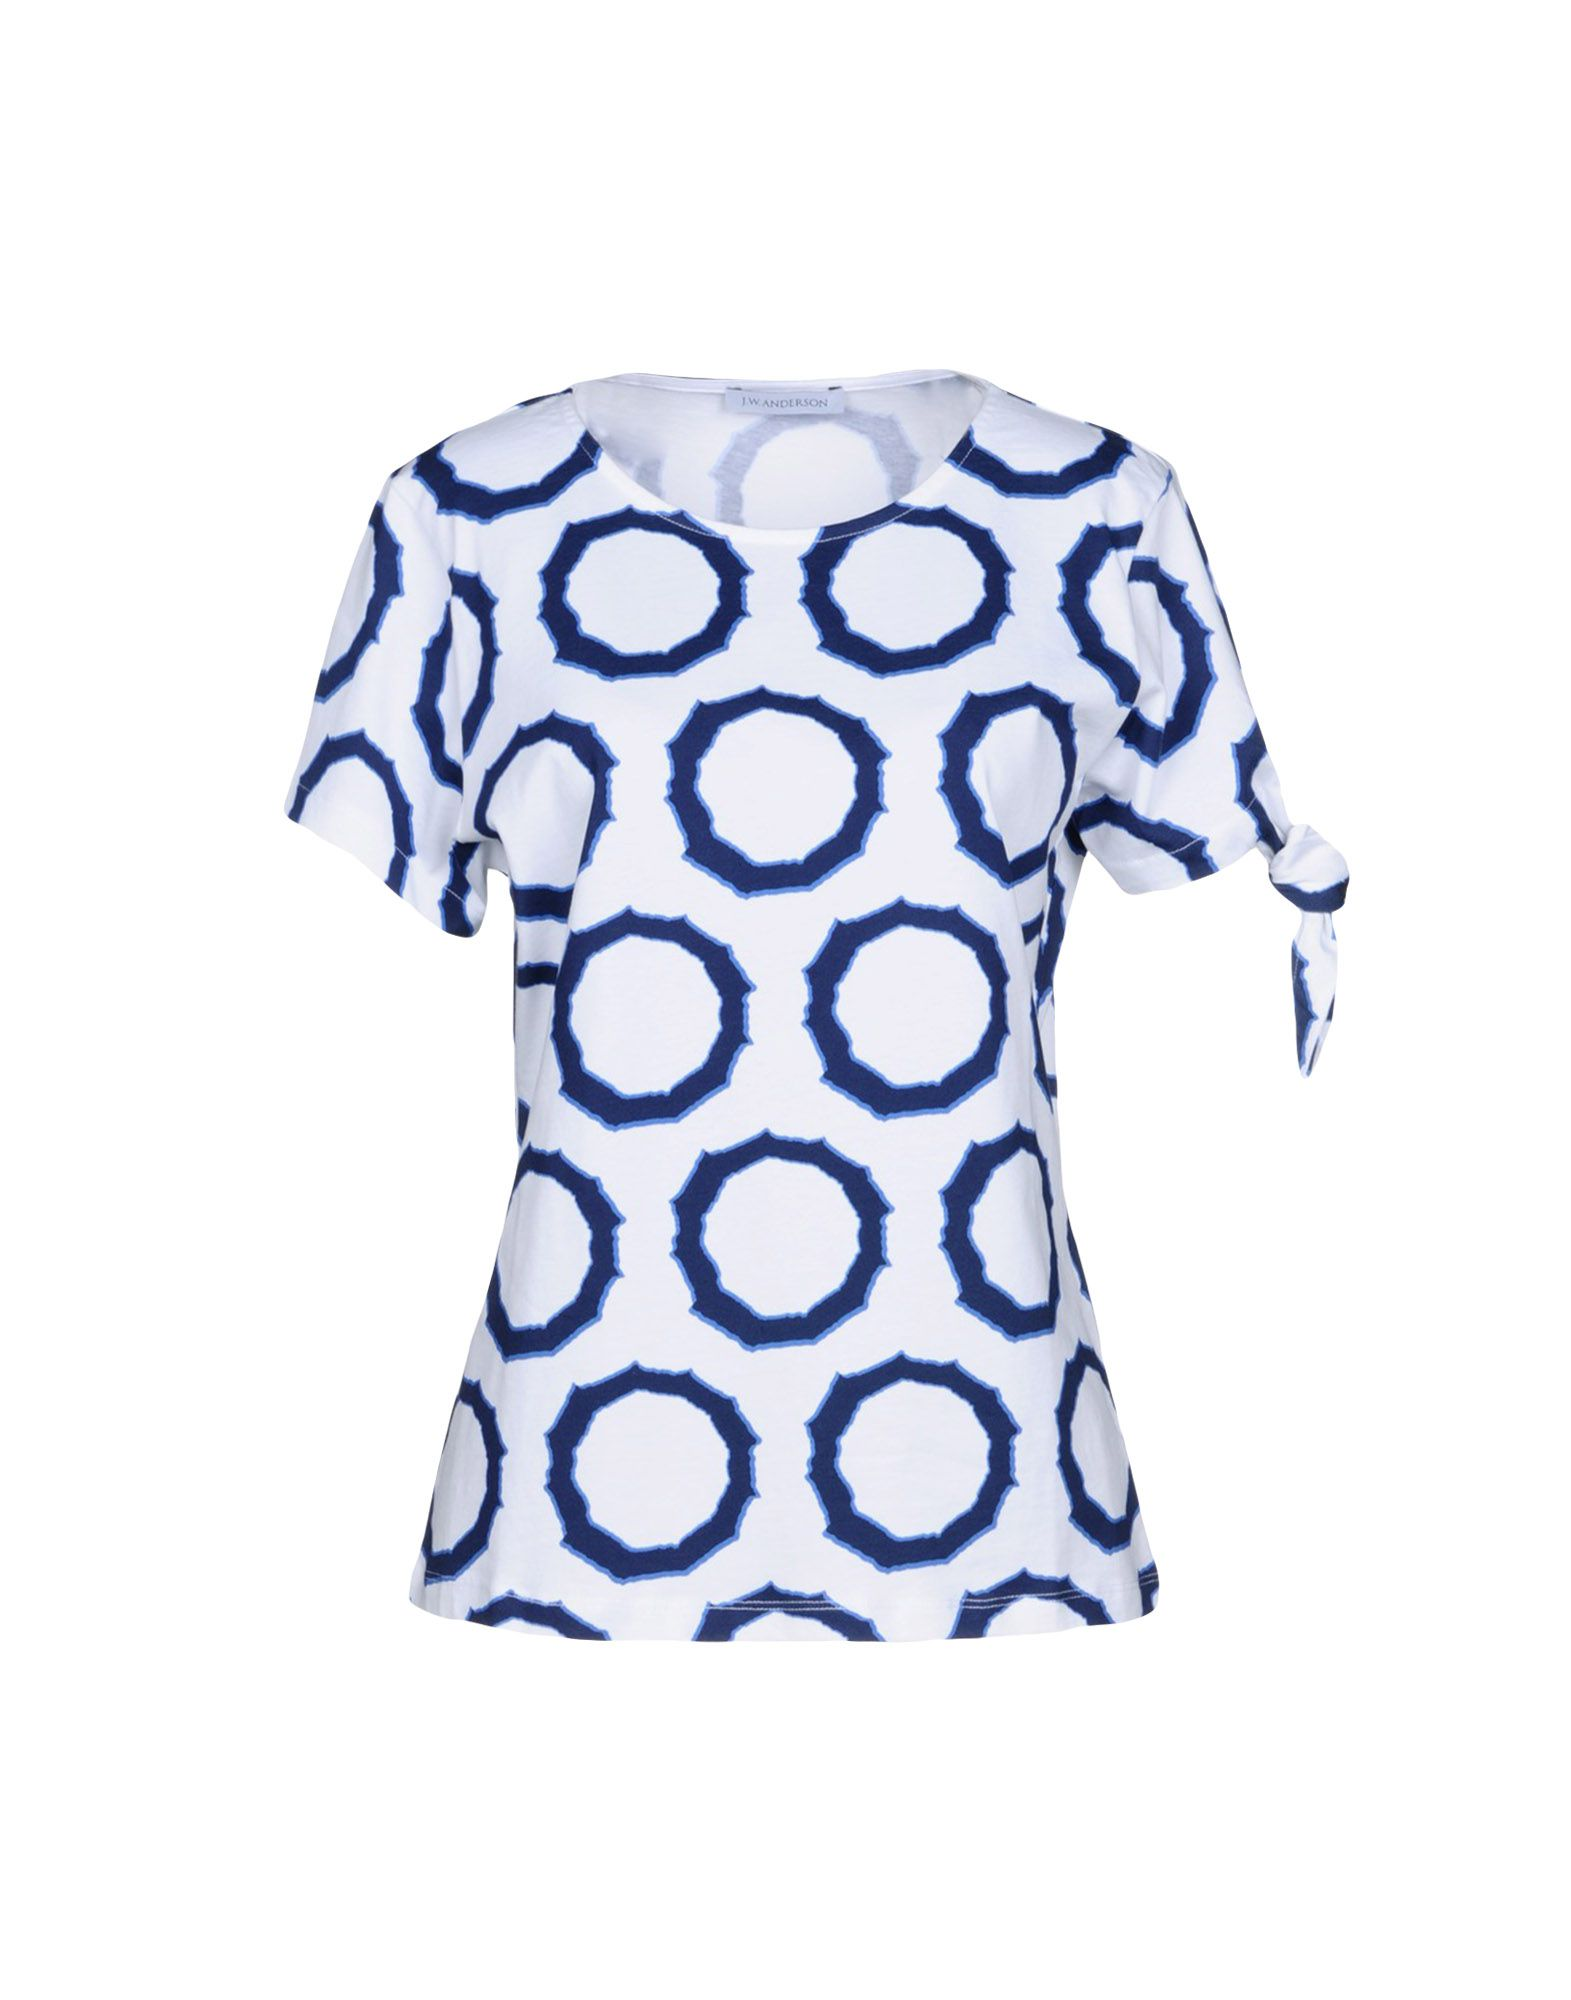 T-Shirt J.W.Anderson Donna - Acquista online su JbafJgk7AH